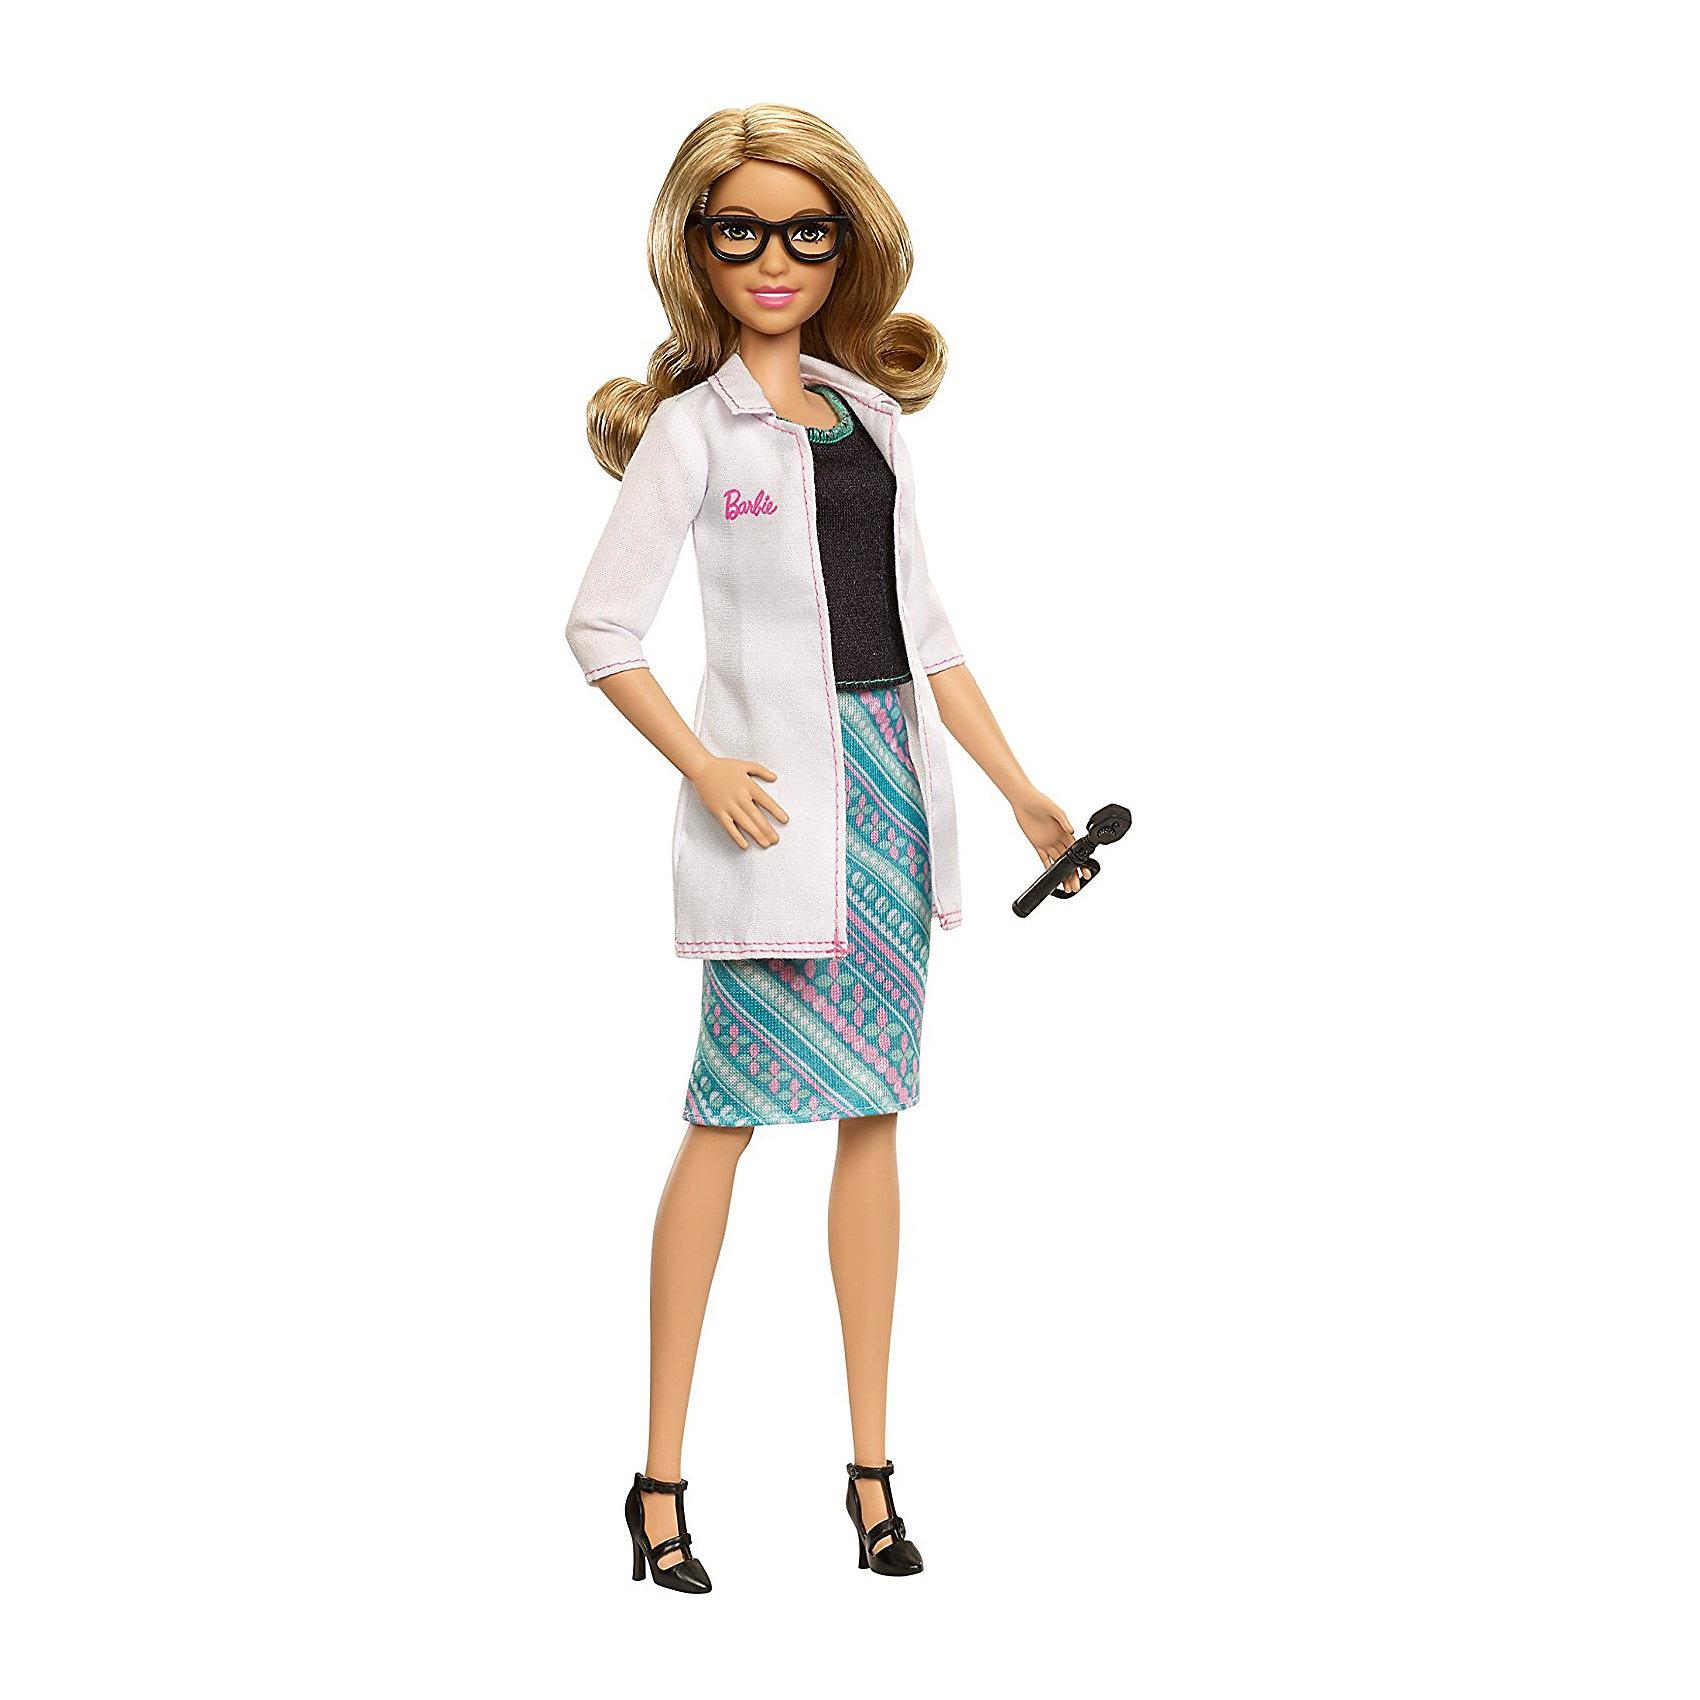 Кукла Mattel Barbie Кем быть? Окулист, 29 смБренды кукол<br><br><br>Ширина мм: 115<br>Глубина мм: 65<br>Высота мм: 330<br>Вес г: 243<br>Возраст от месяцев: 36<br>Возраст до месяцев: 120<br>Пол: Женский<br>Возраст: Детский<br>SKU: 7140494